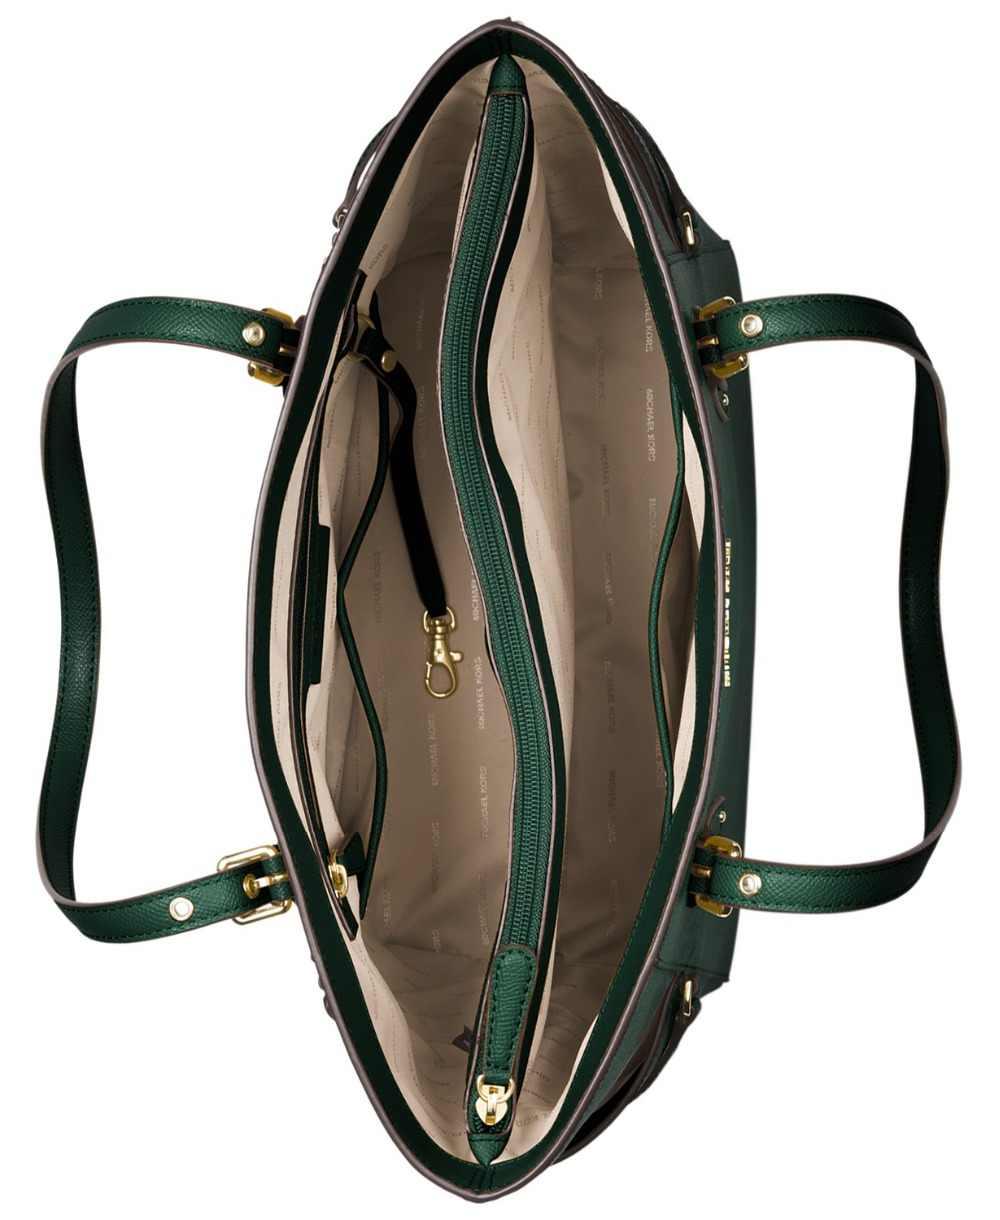 1549c884cd26ea ... Michael Kors Voyager East West Crossgrain Leather Tote (Racing  Green/Gold) by MK ...